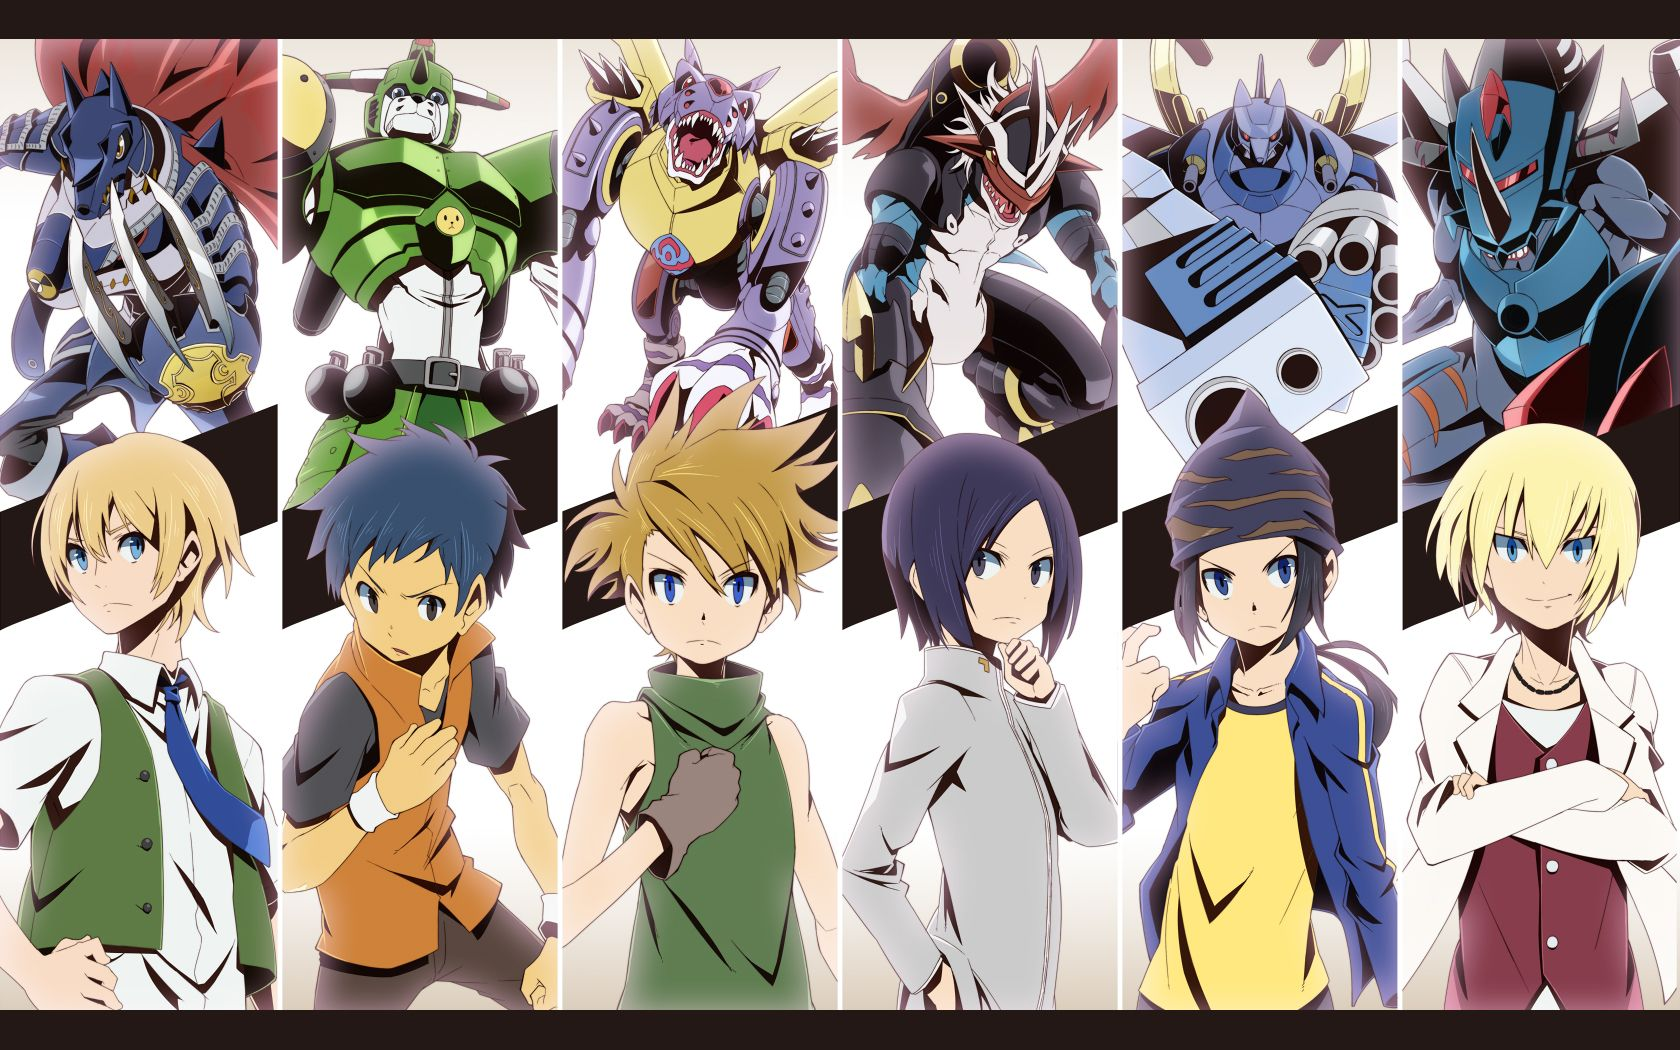 Digimon HD 4K Wallpaper for PC